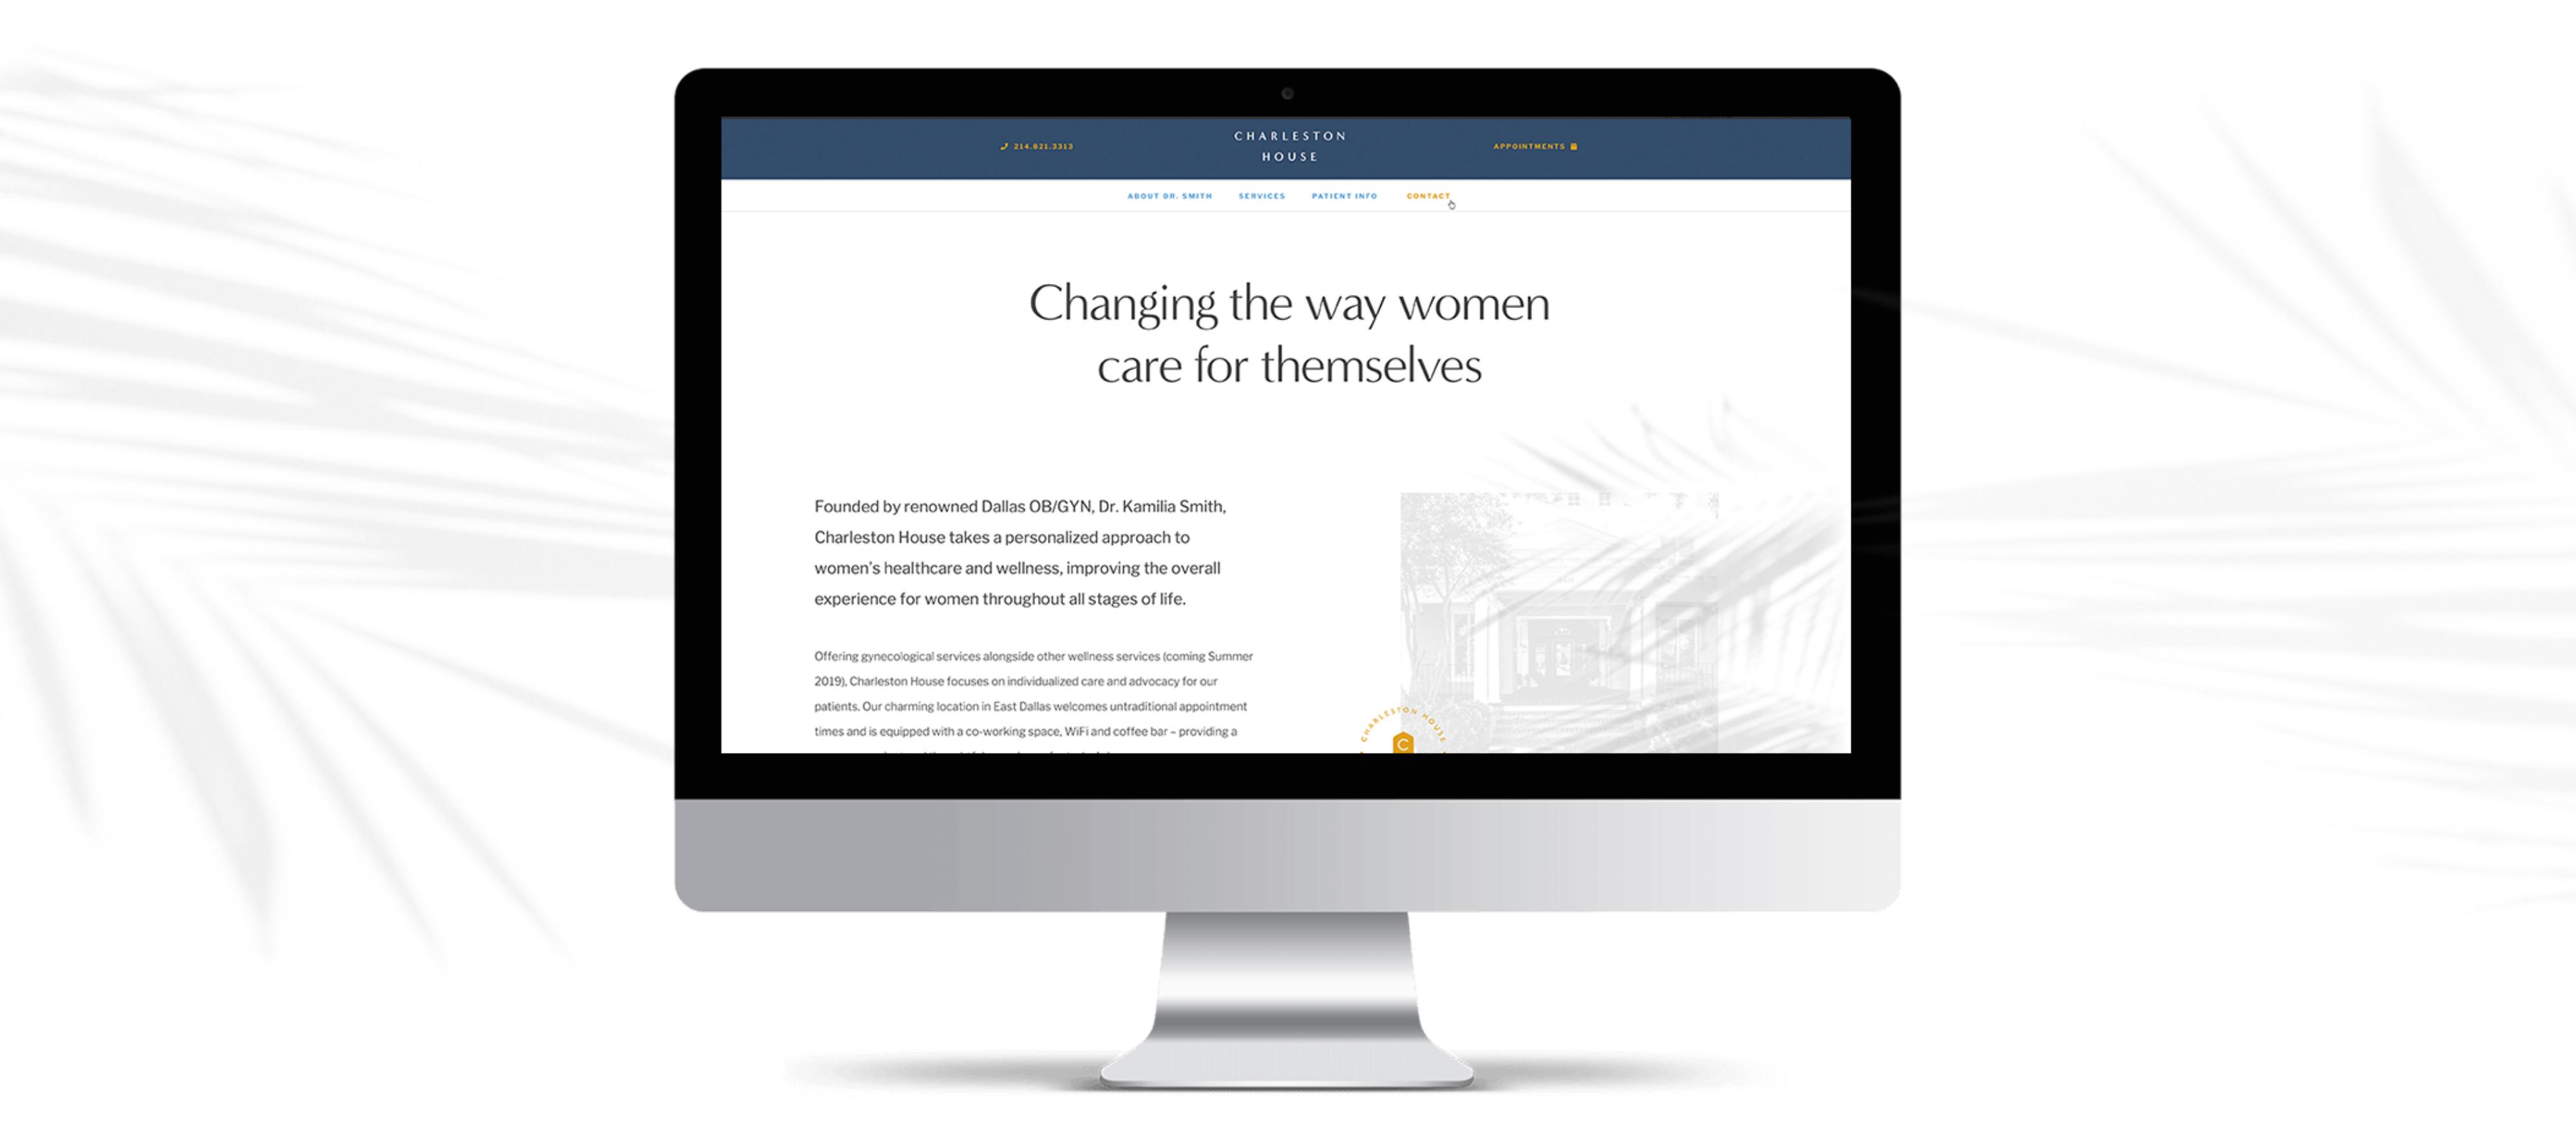 charleston house website mockup on a mac